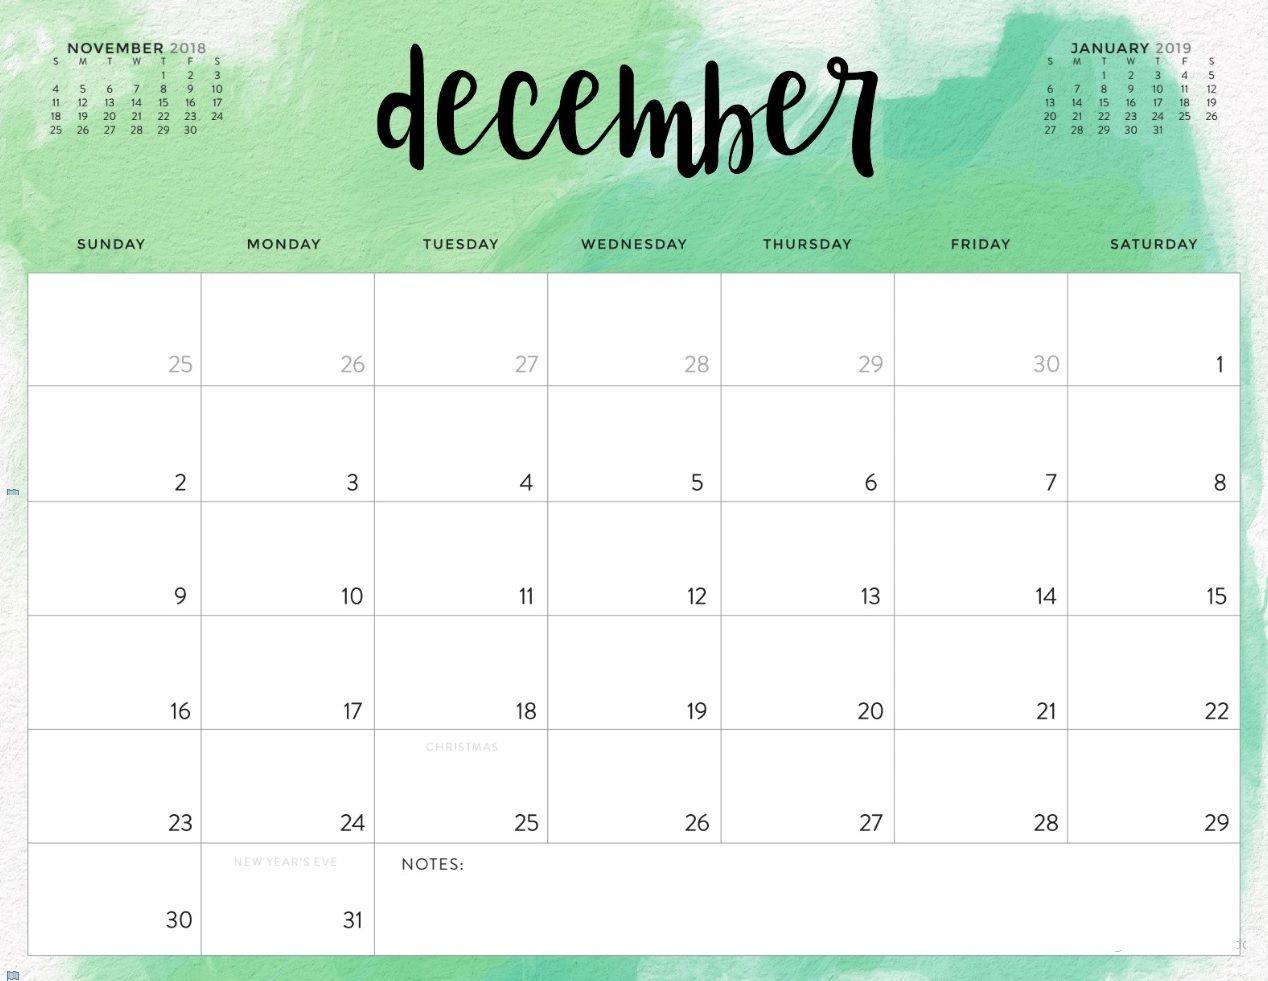 Free December 2018 Calendar Word Pdf Doc Excel Notes Templates Blank inside Christmas Calendar Printable Template